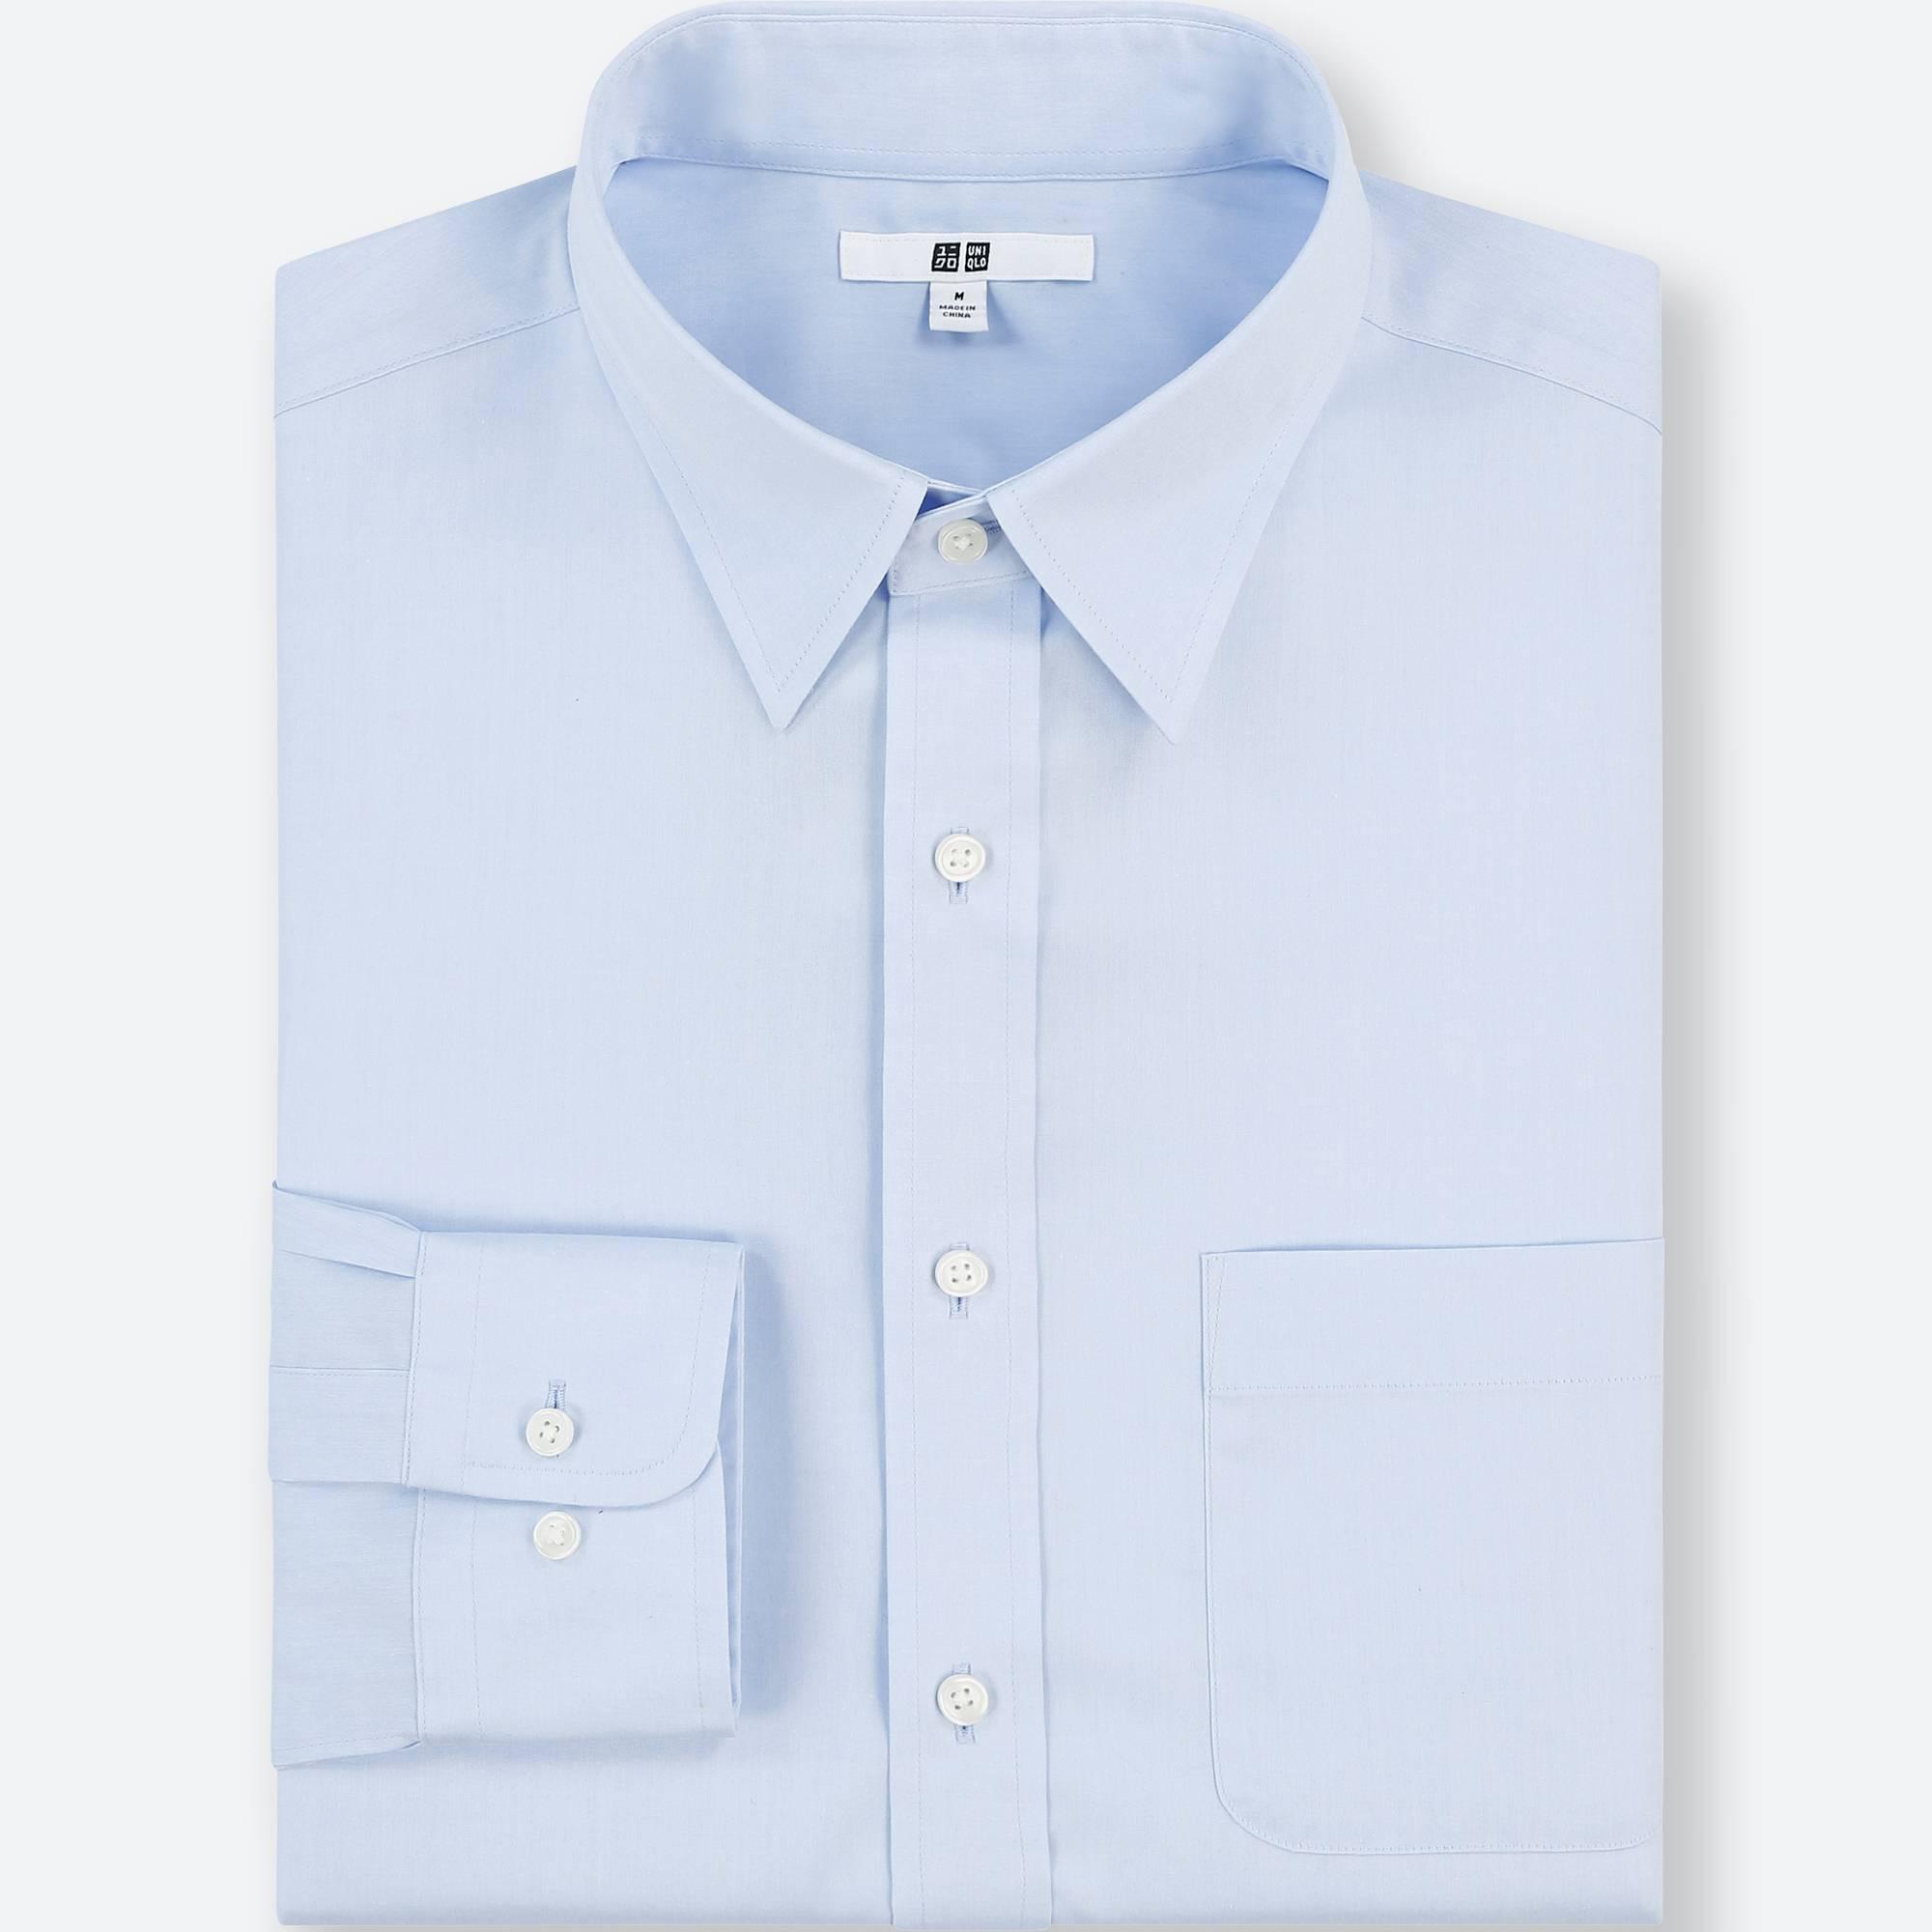 customized for you shop easy care shirts uniqlo us uniqlo us